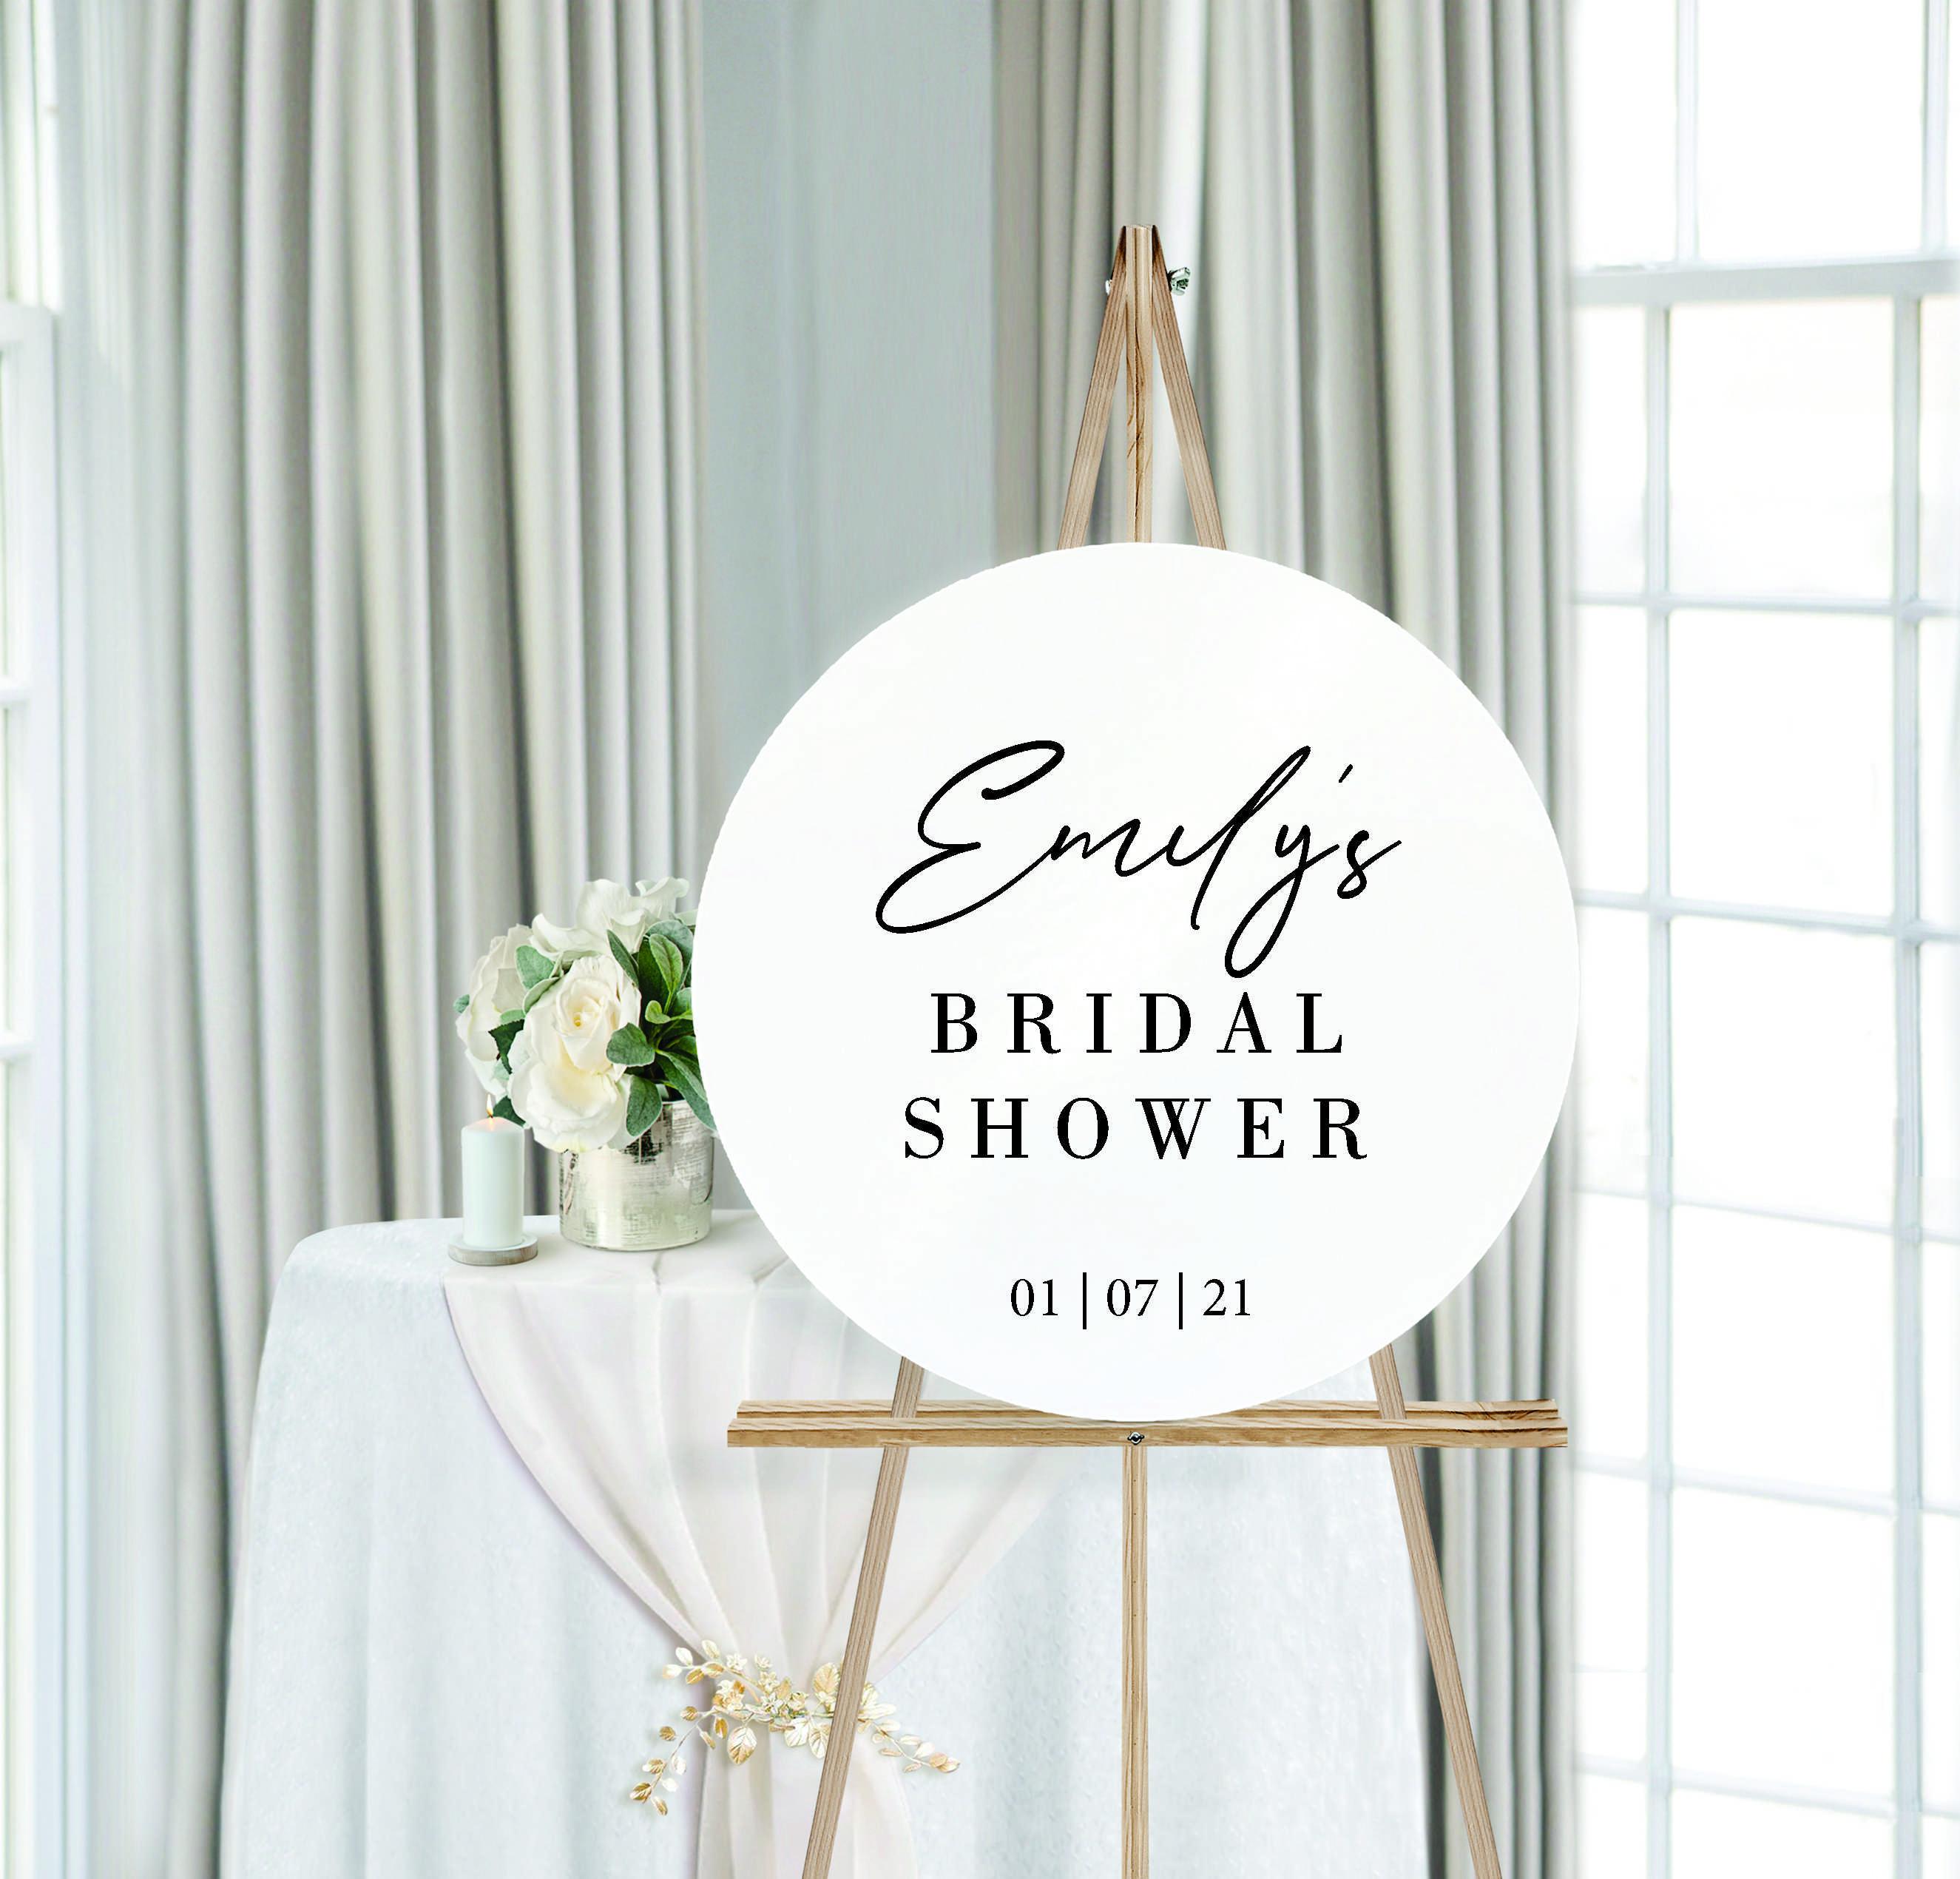 Personalised Bridal Shower Round Wedding Sign